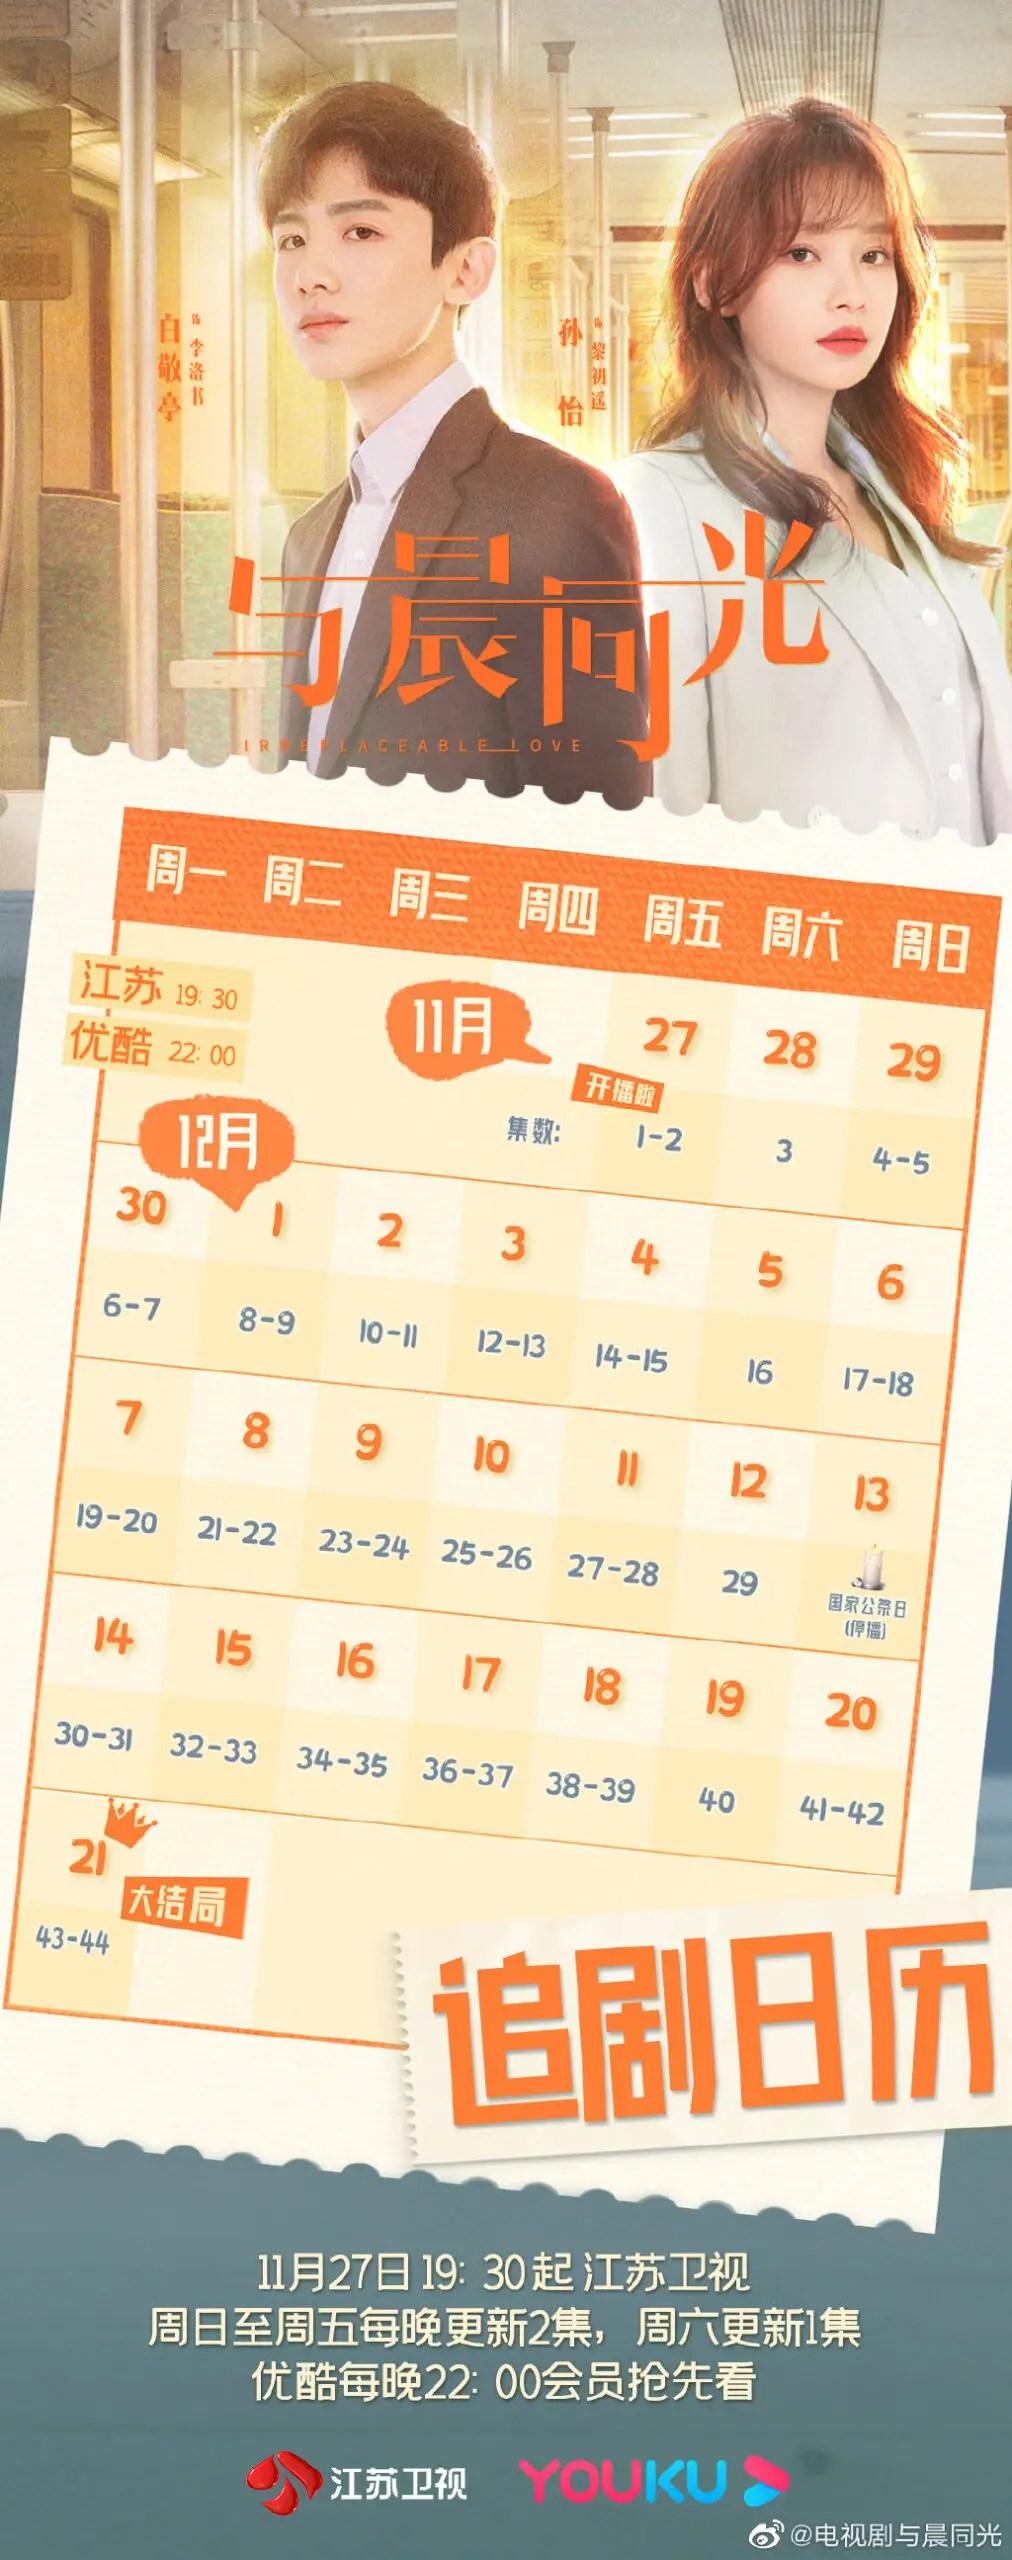 Irreplaceable Love Chinese Drama Airing Calendar